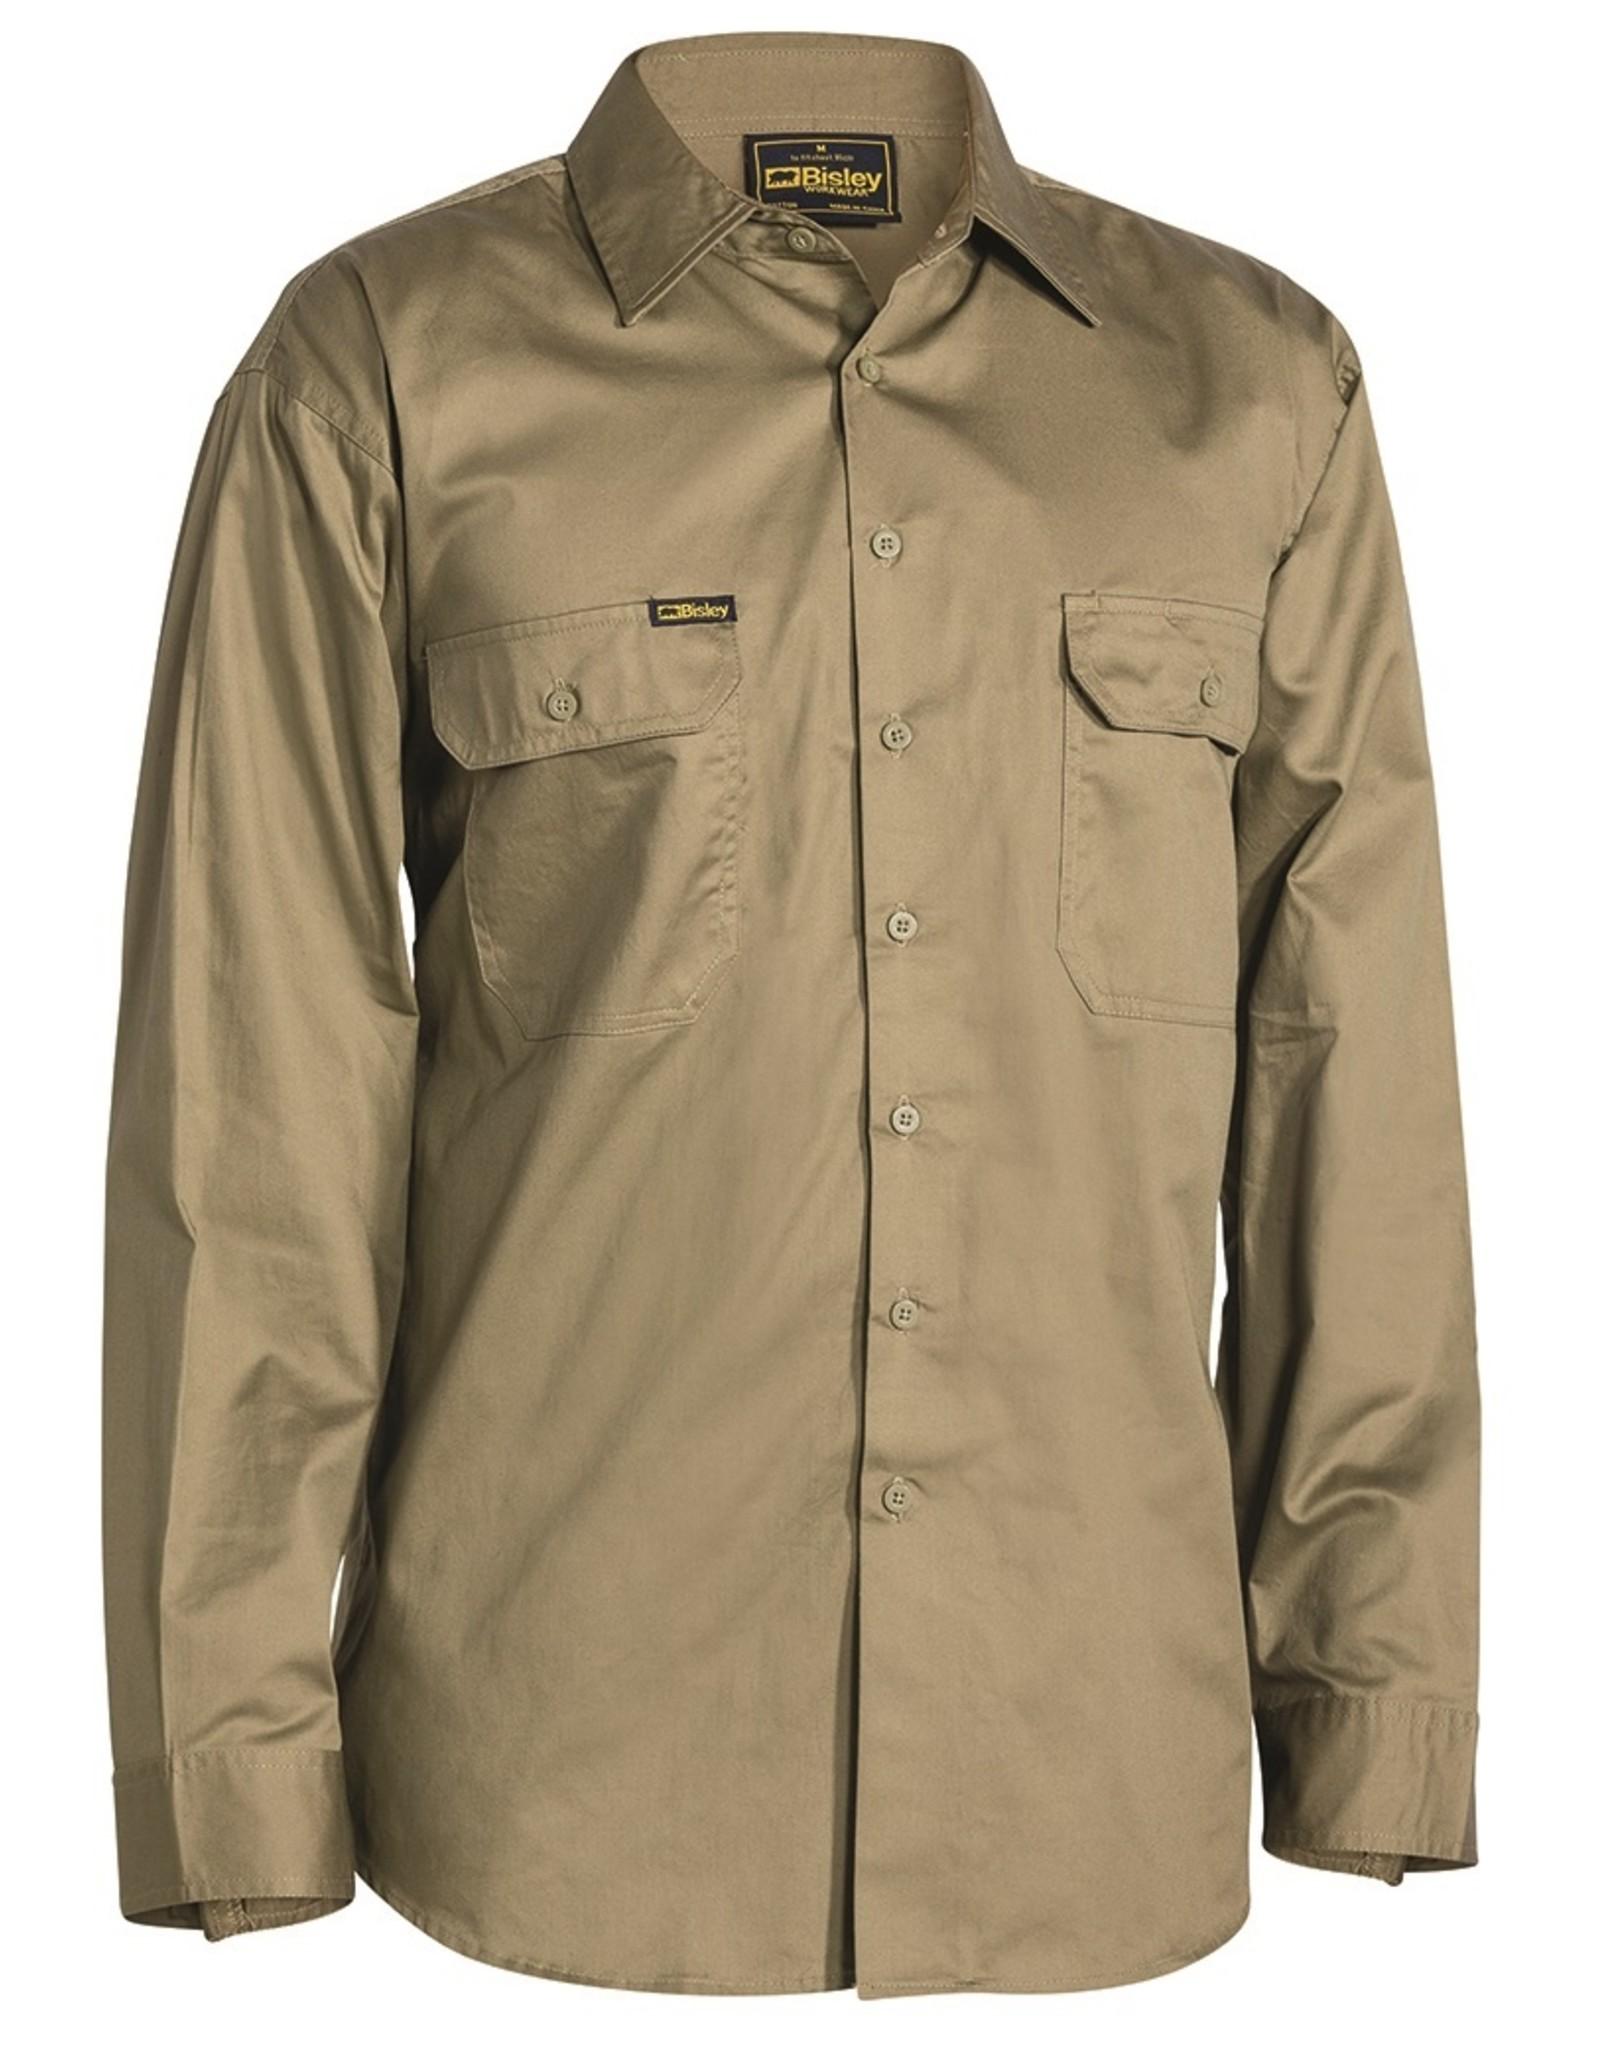 Bisley Bisley Cool Lightweight LS Drill Work Shirt